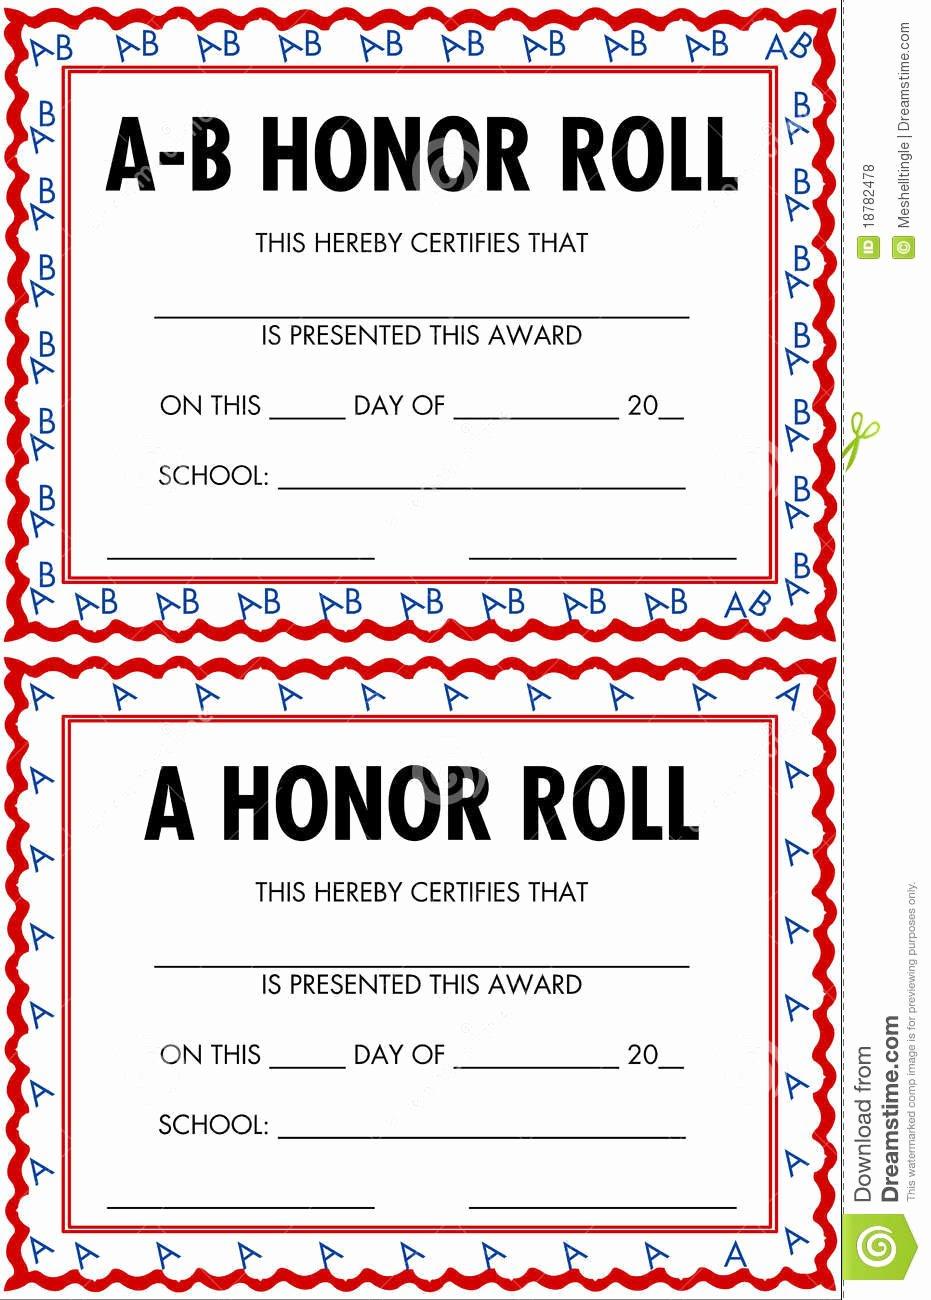 Editable Honor Roll Certificate Lovely Honor Roll Certificates Stock Vector Image Of Black